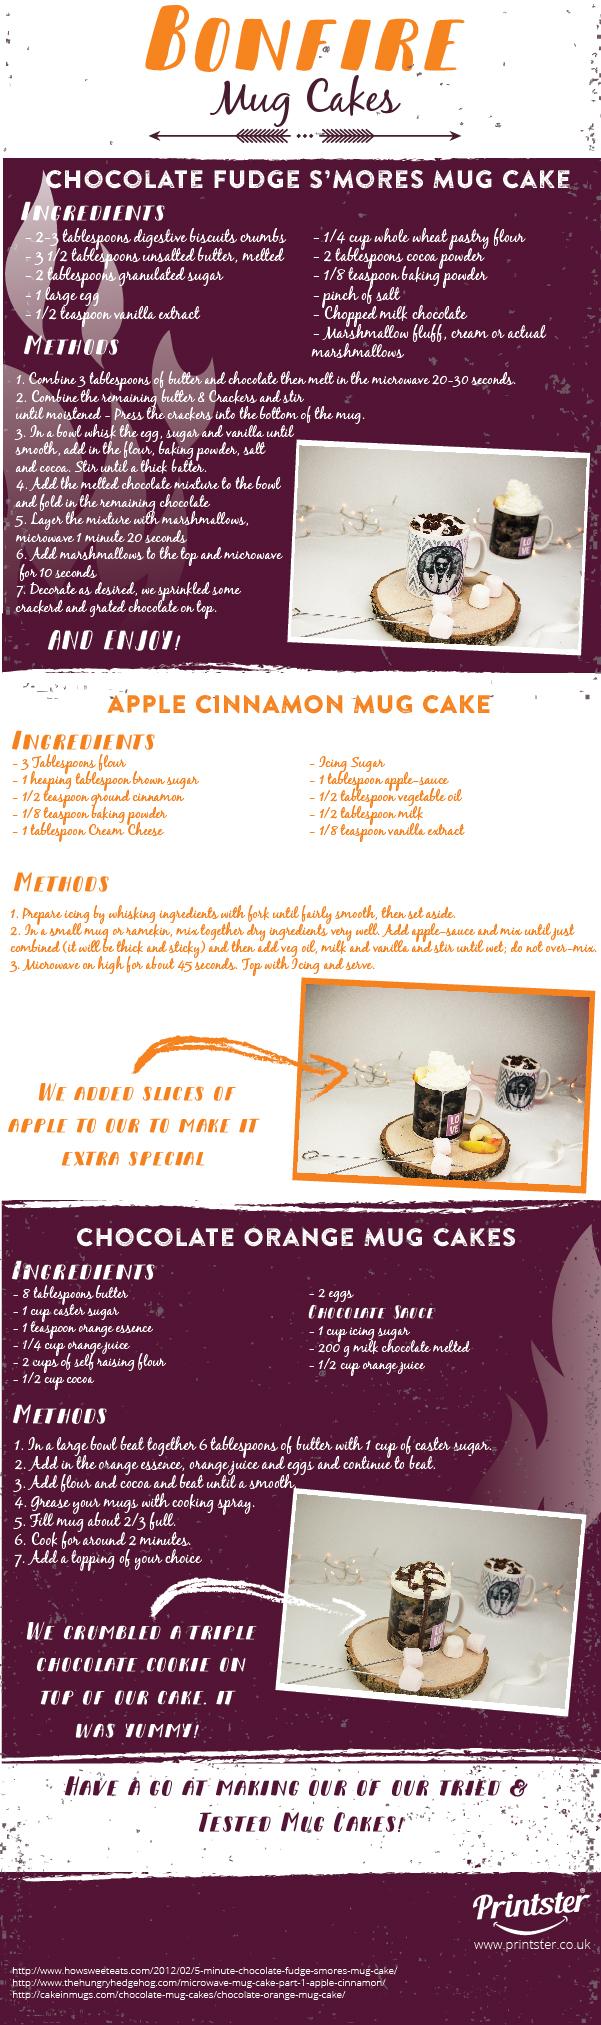 Bonfire - Mug Cakes